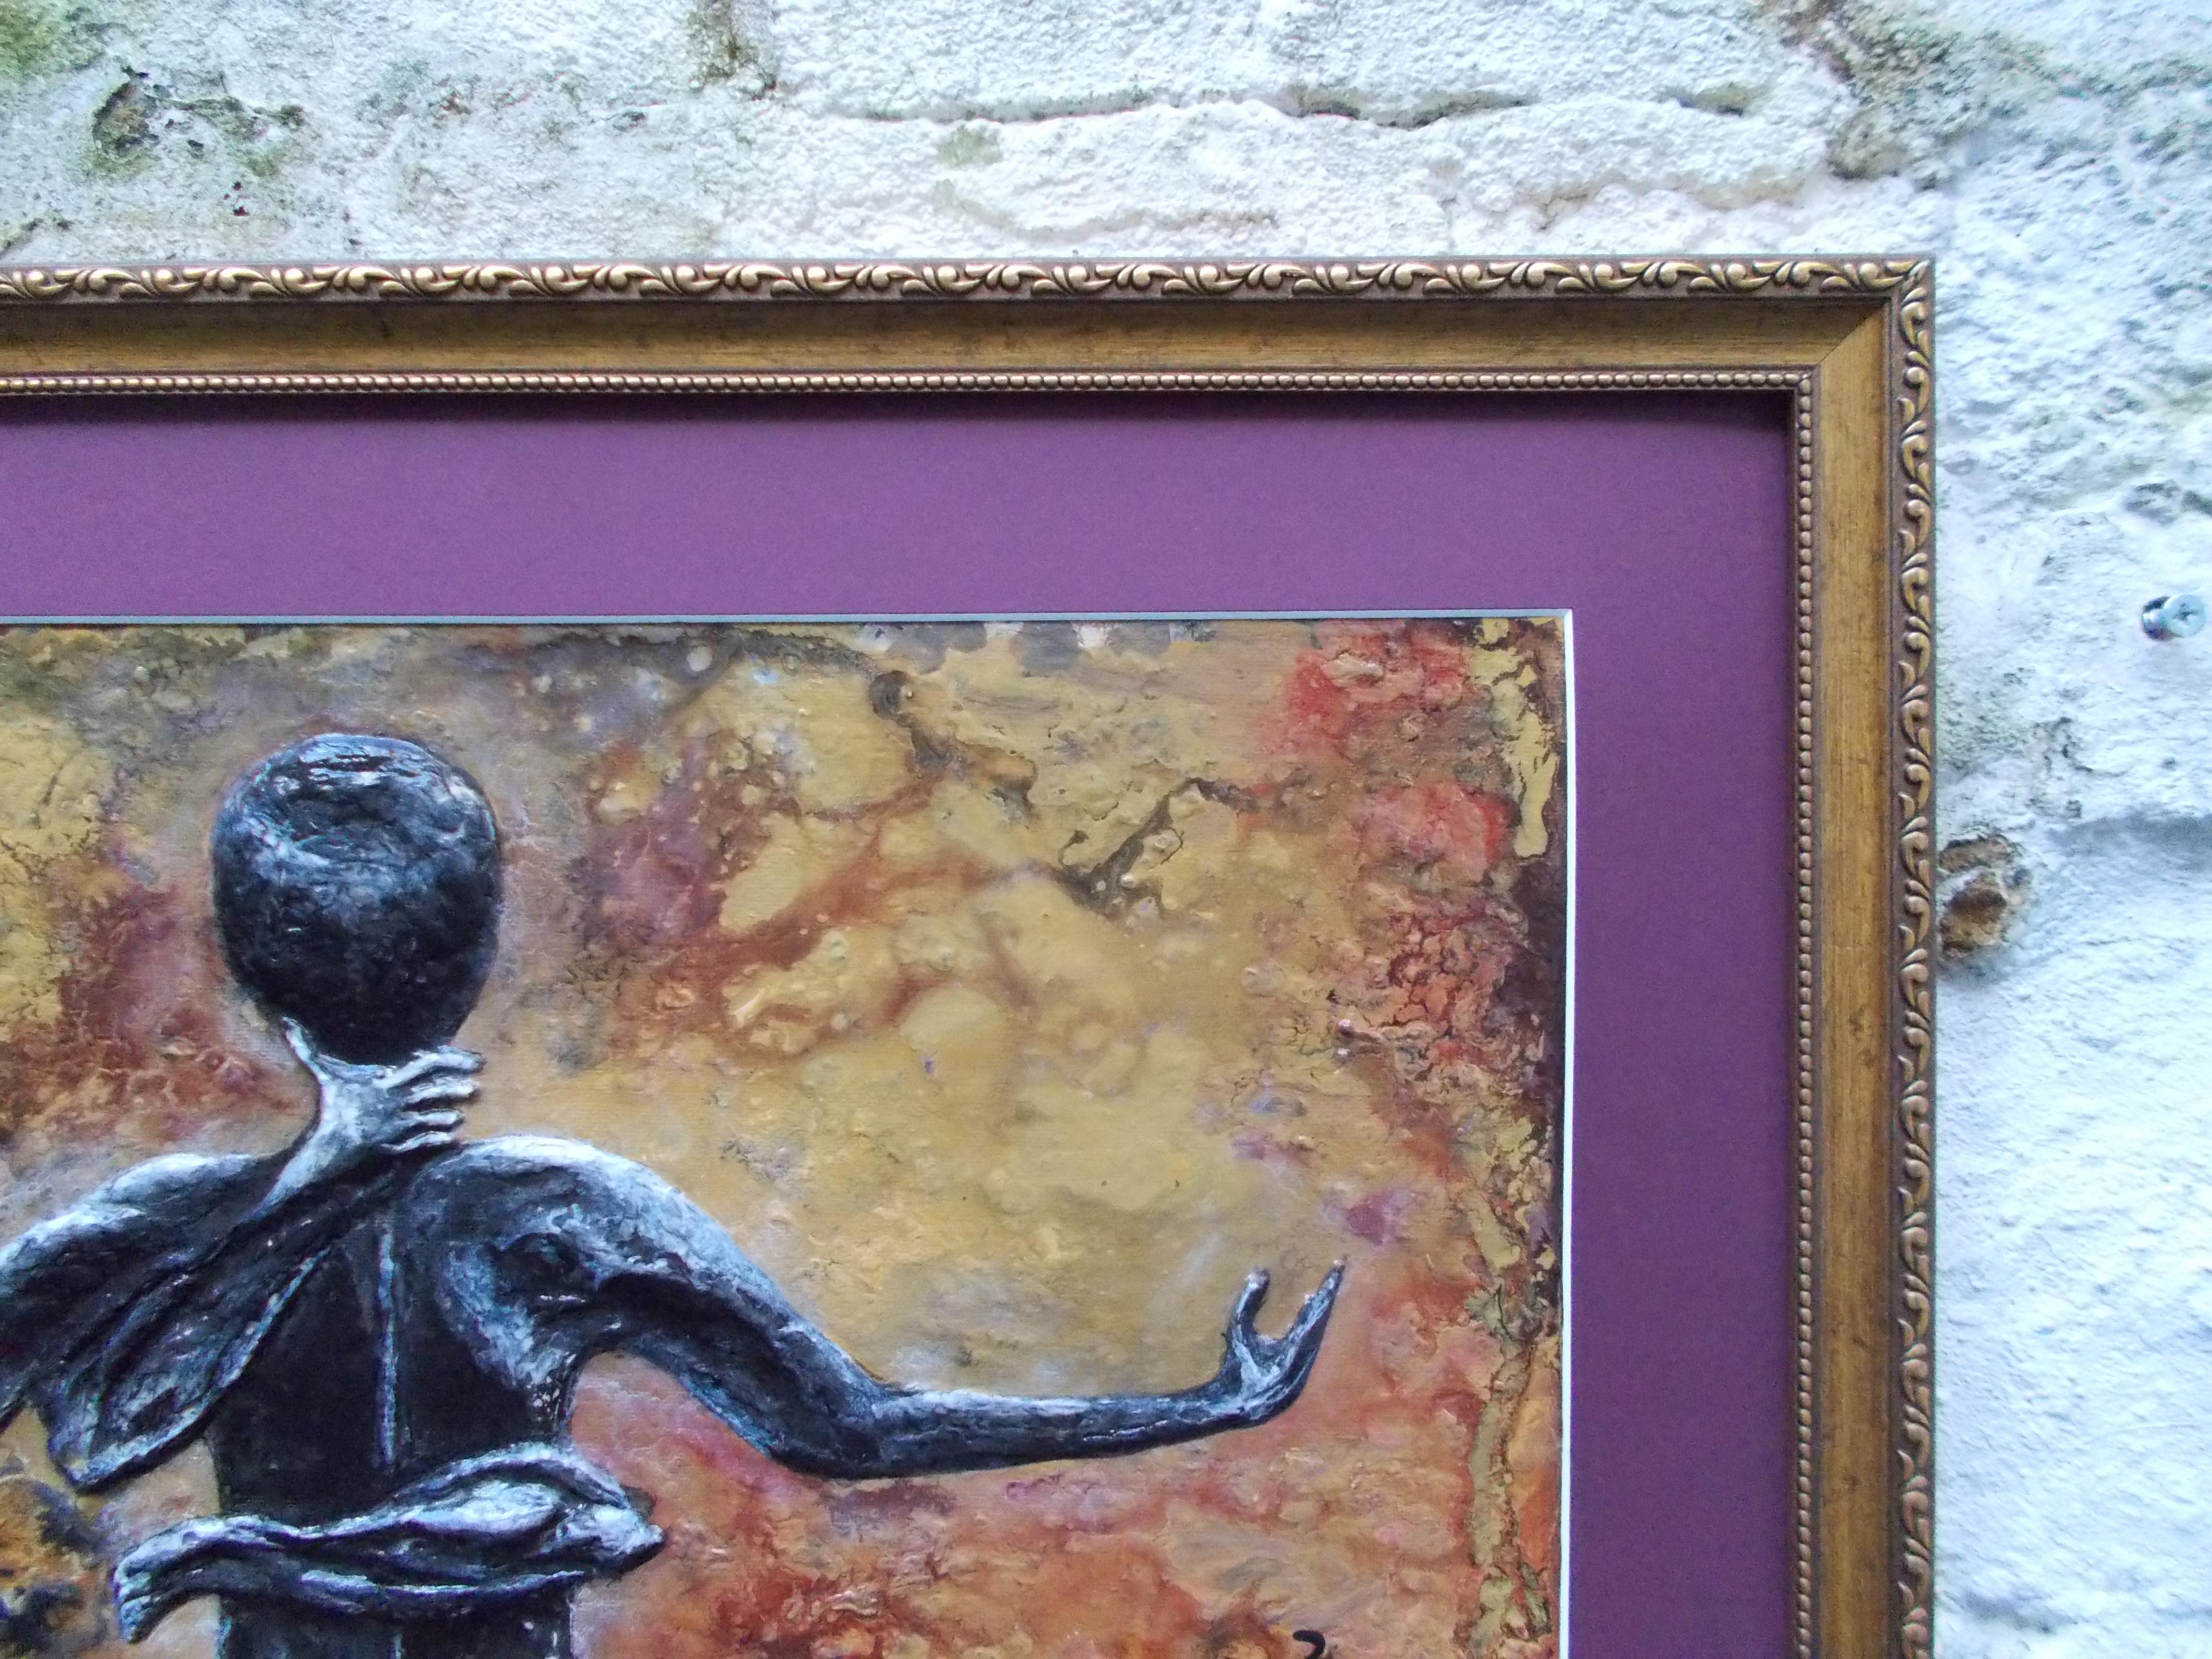 Scorpio-The-Scorpion-Oct 23-Nov 21-Jurita-2019-Painting Relief 3D-mixed-media-acrylic-clay-40x50cm© (15)